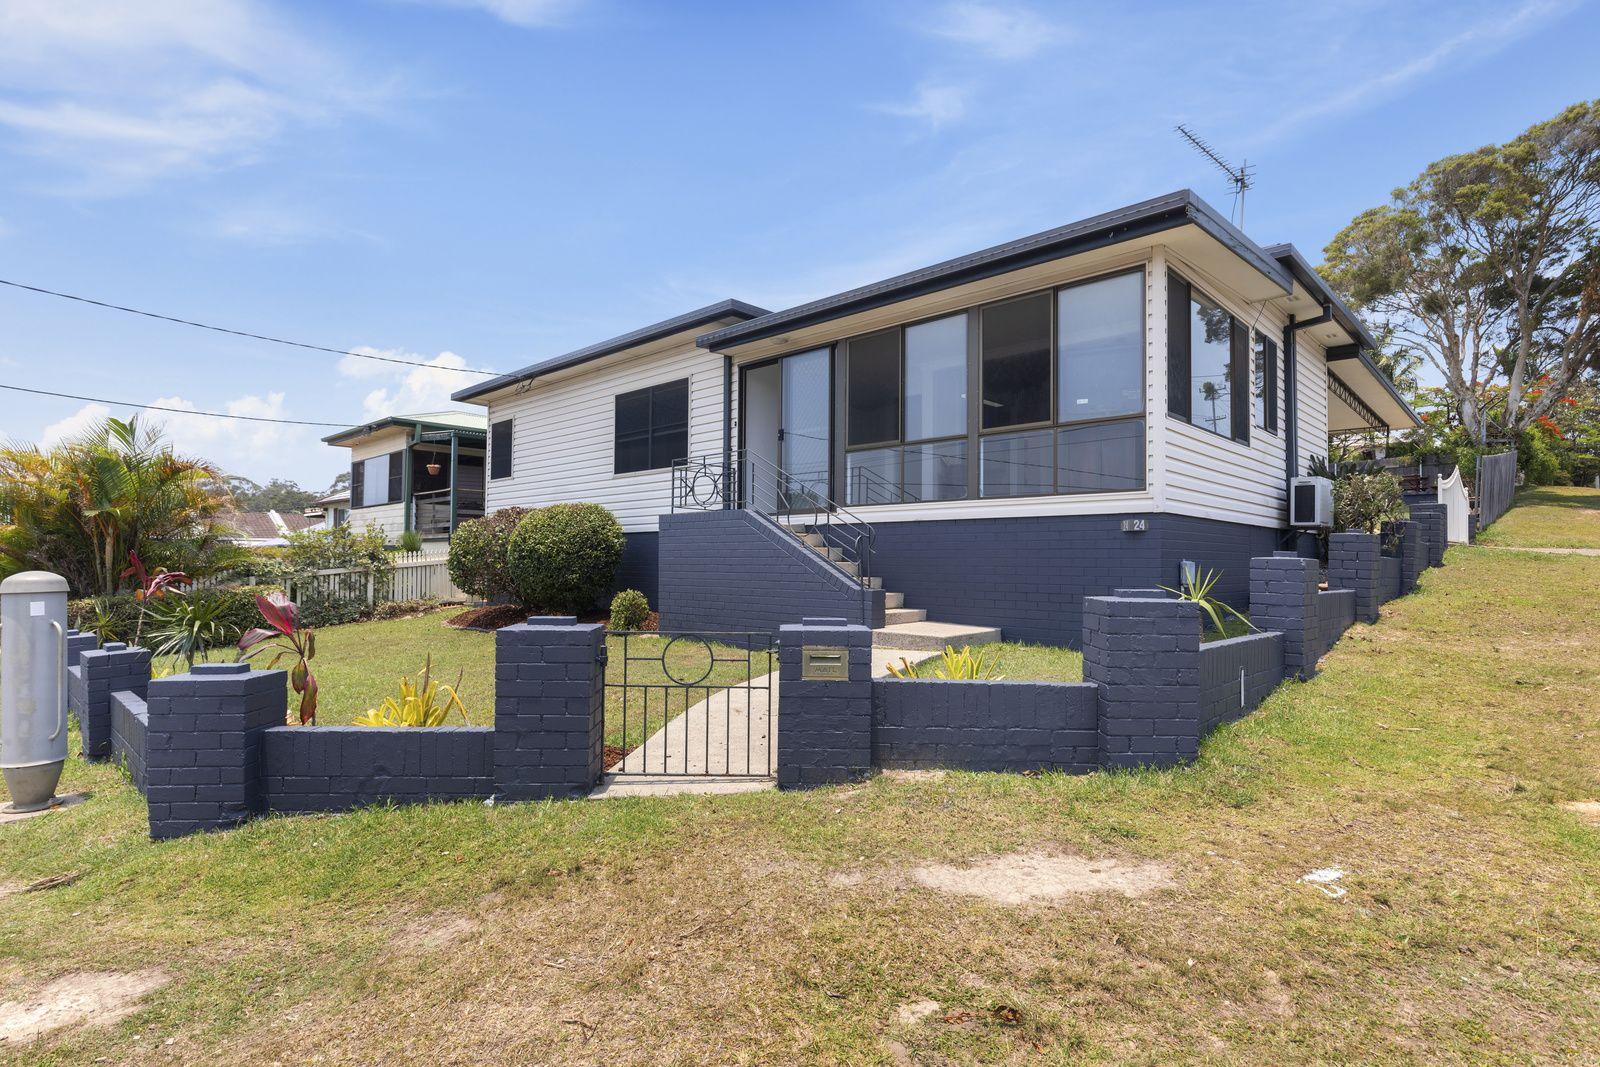 24 Combine Street, Coffs Harbour NSW 2450, Image 0